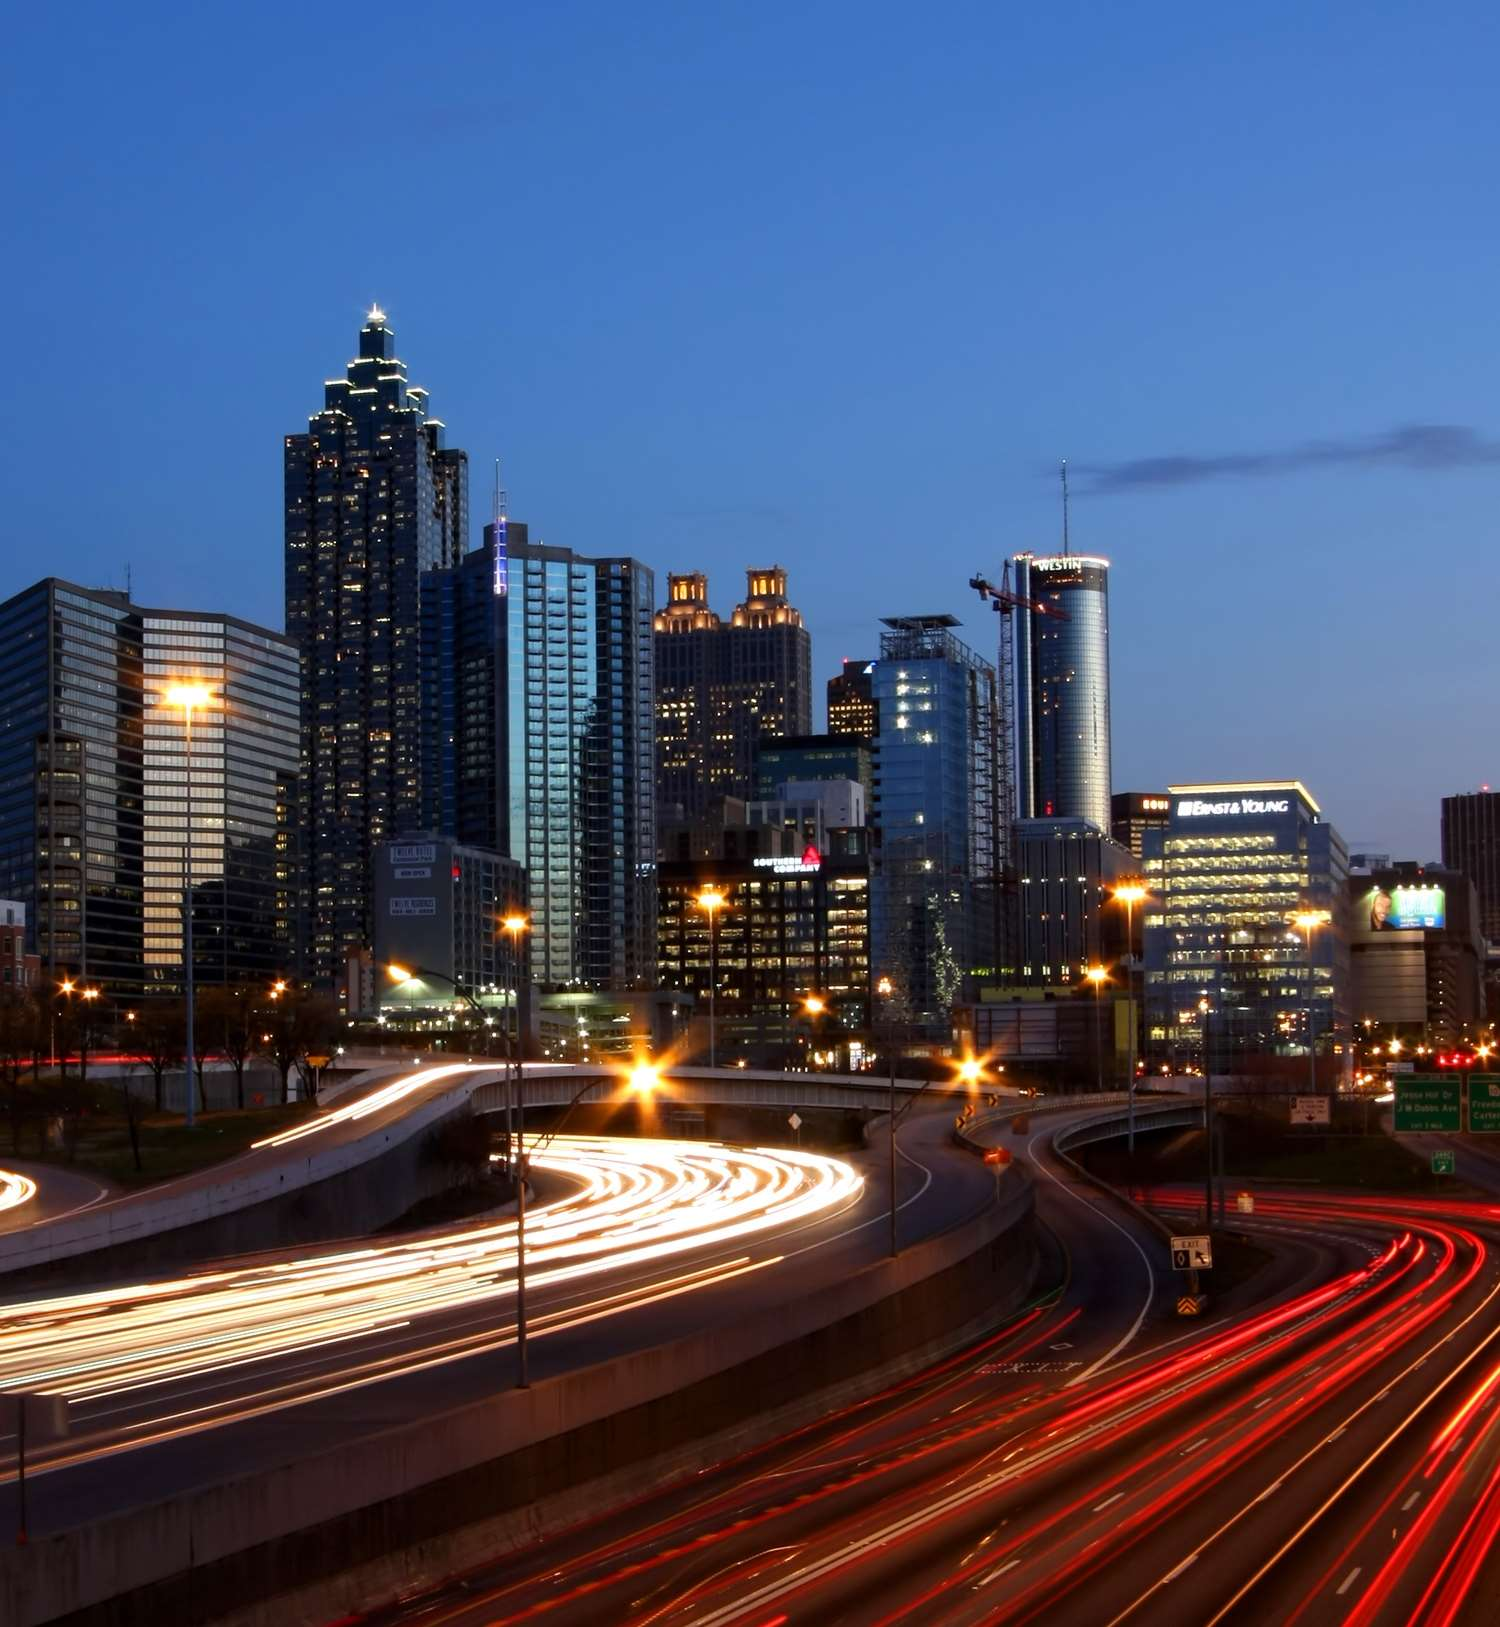 Hilton Garden Inn Atlanta Airport/Millenium Center image 2